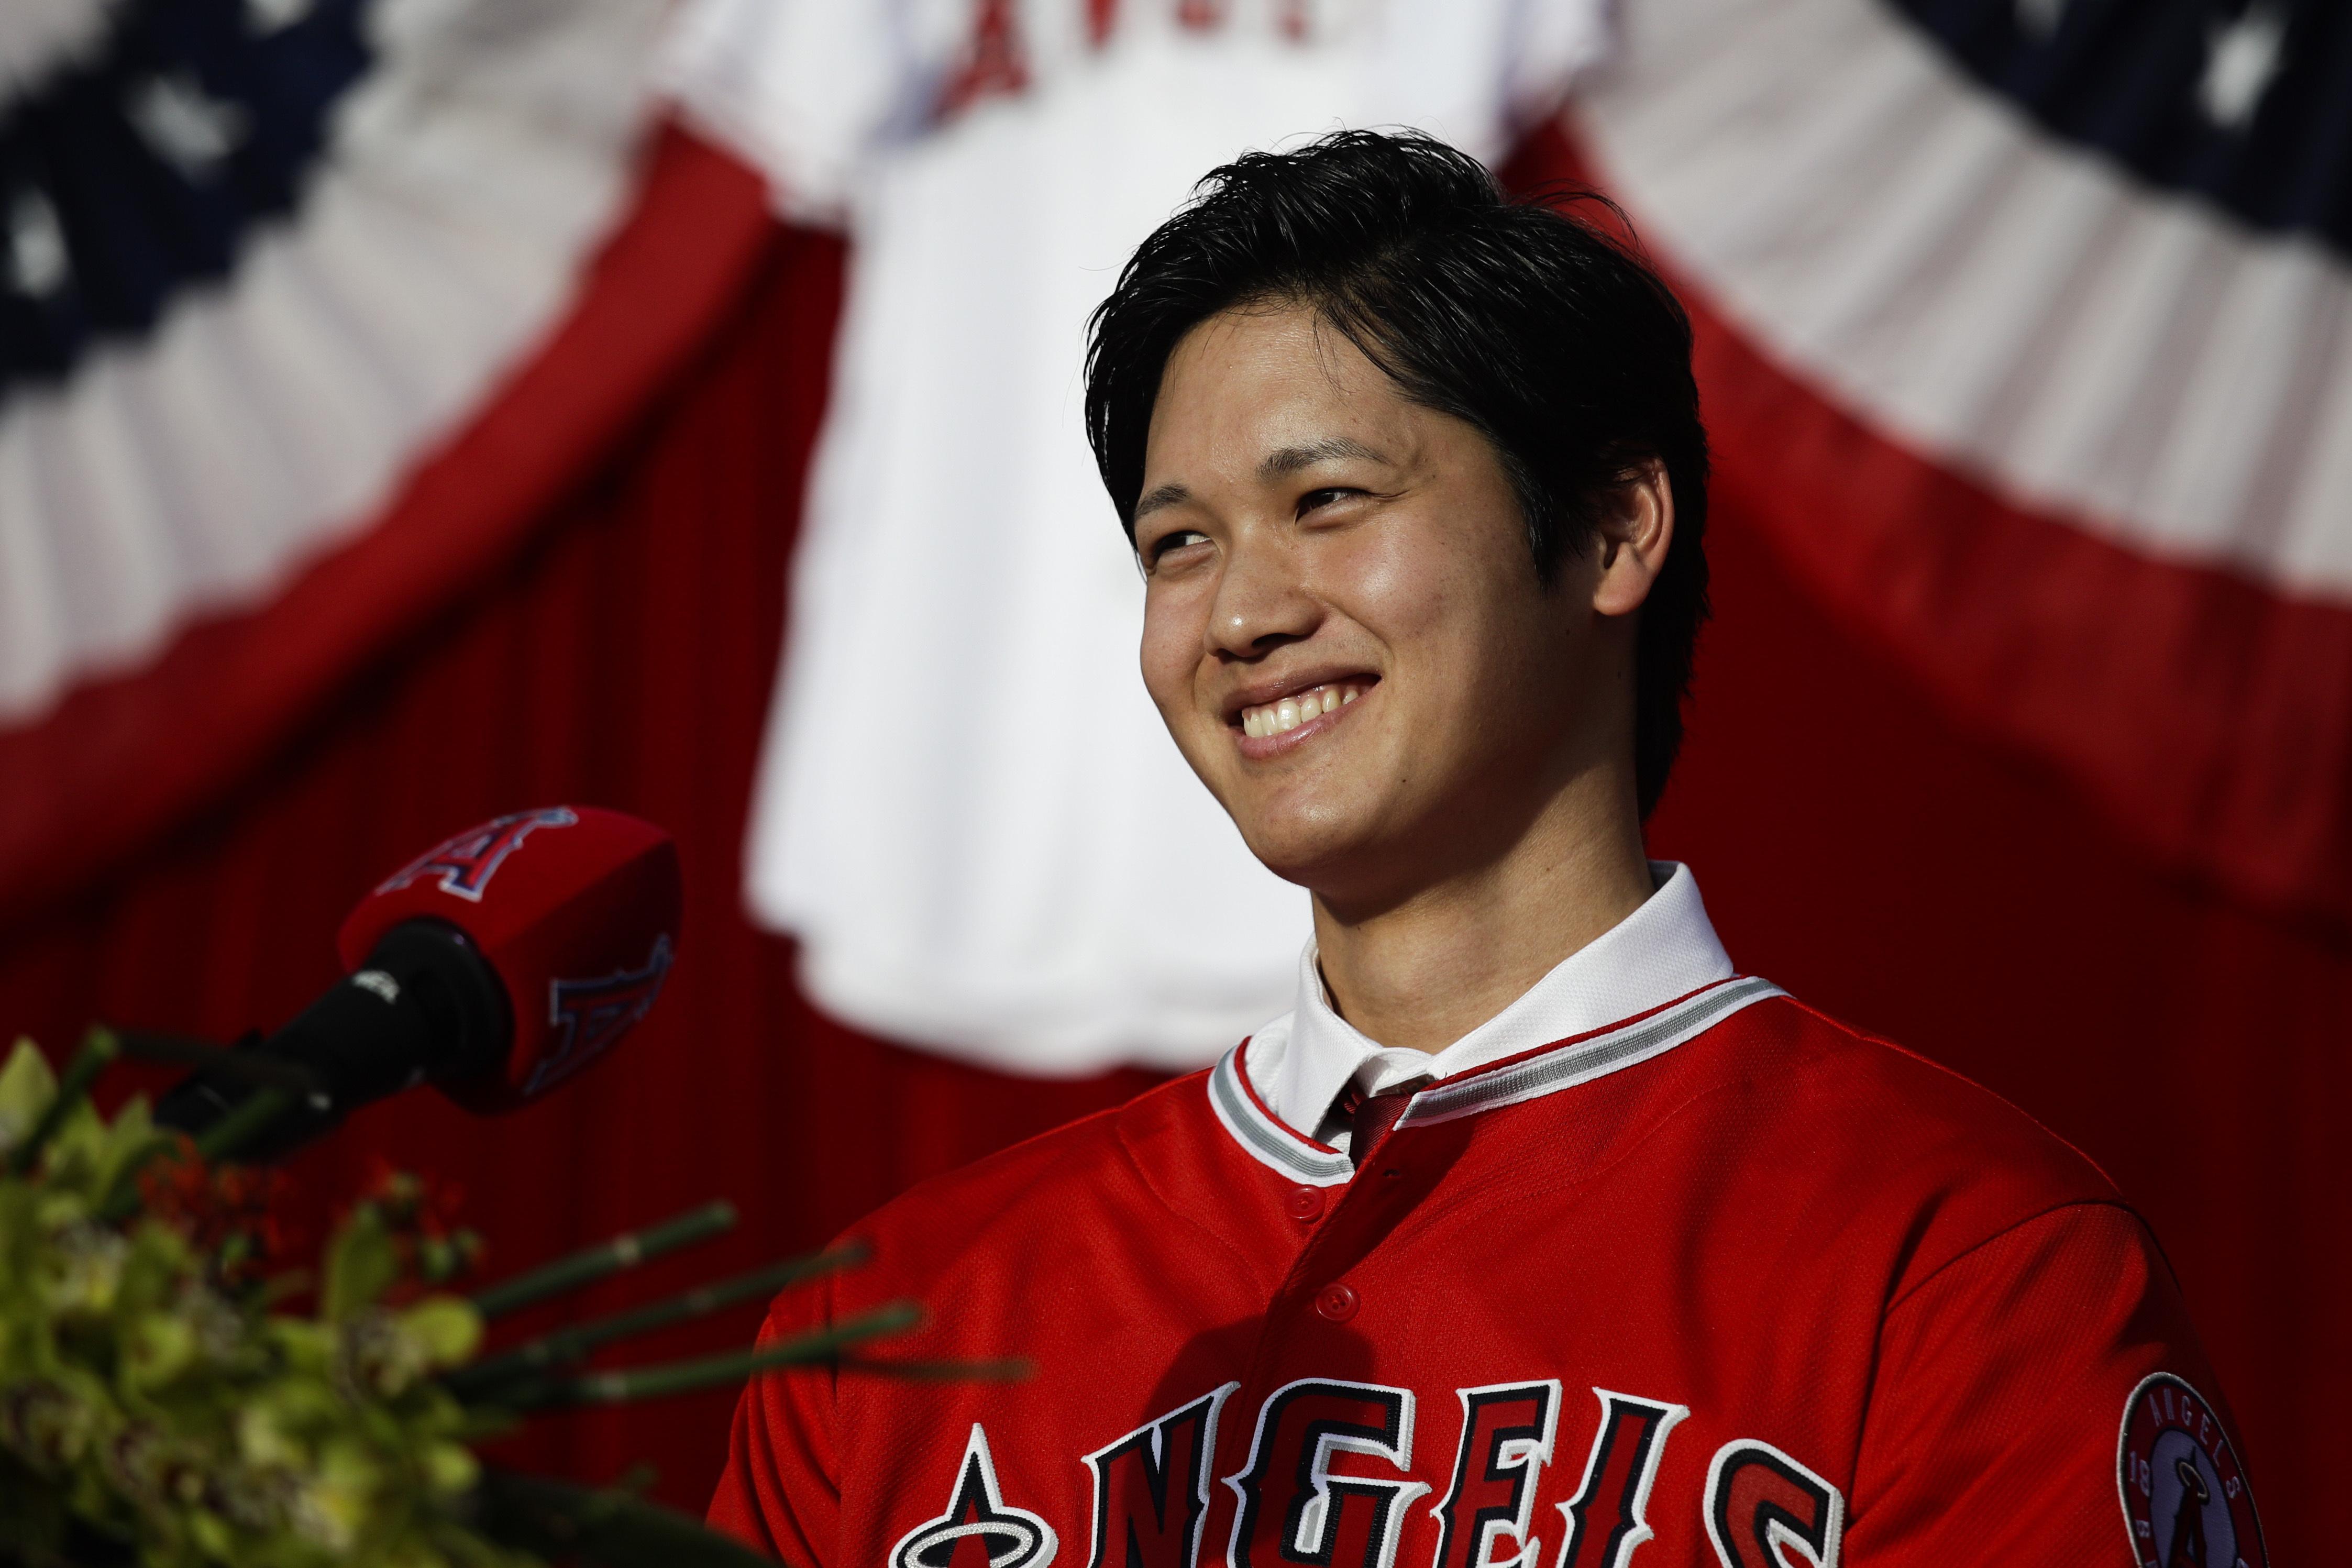 Angels_ohtani_baseball_35424